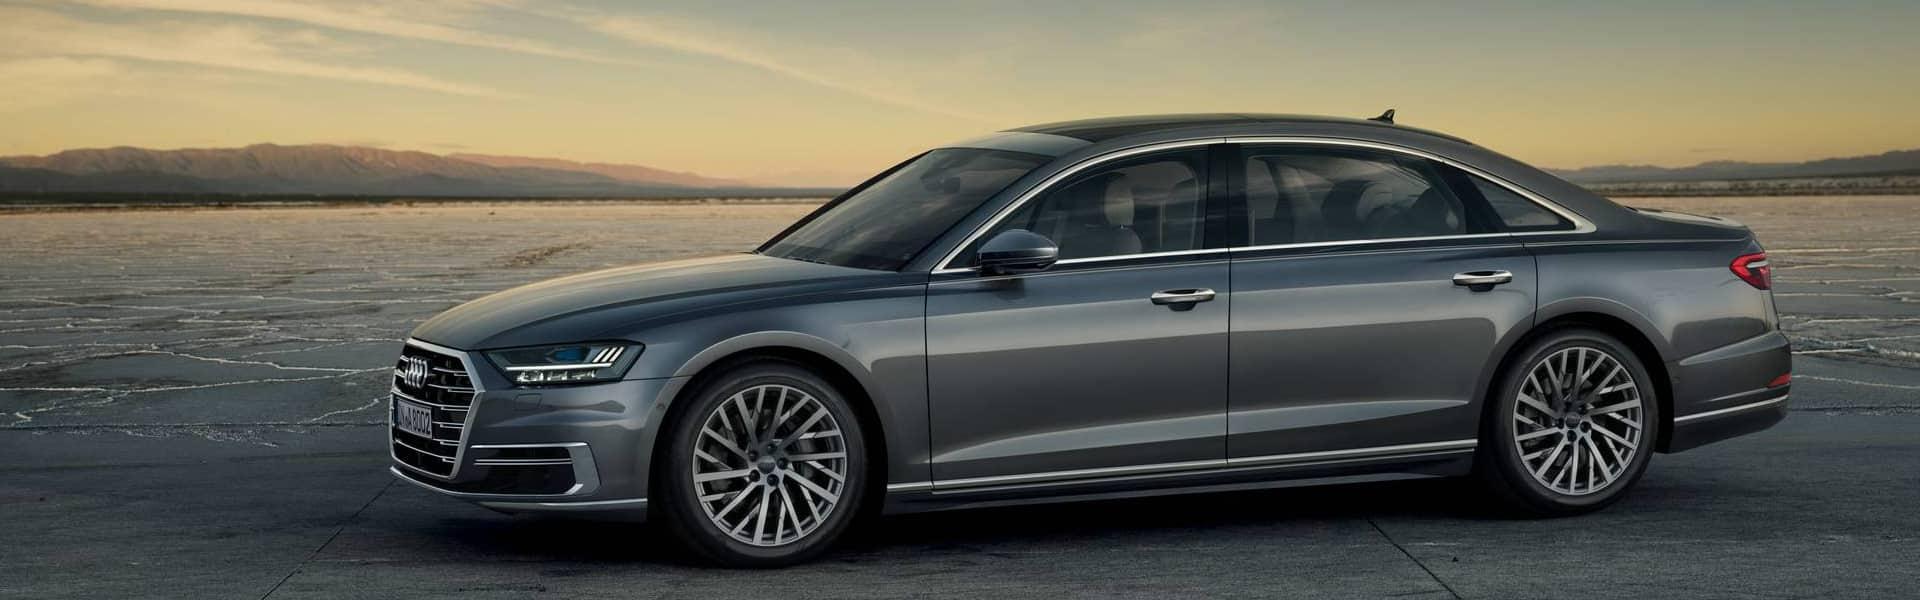 The New A L A Audi Singapore - Audi a8